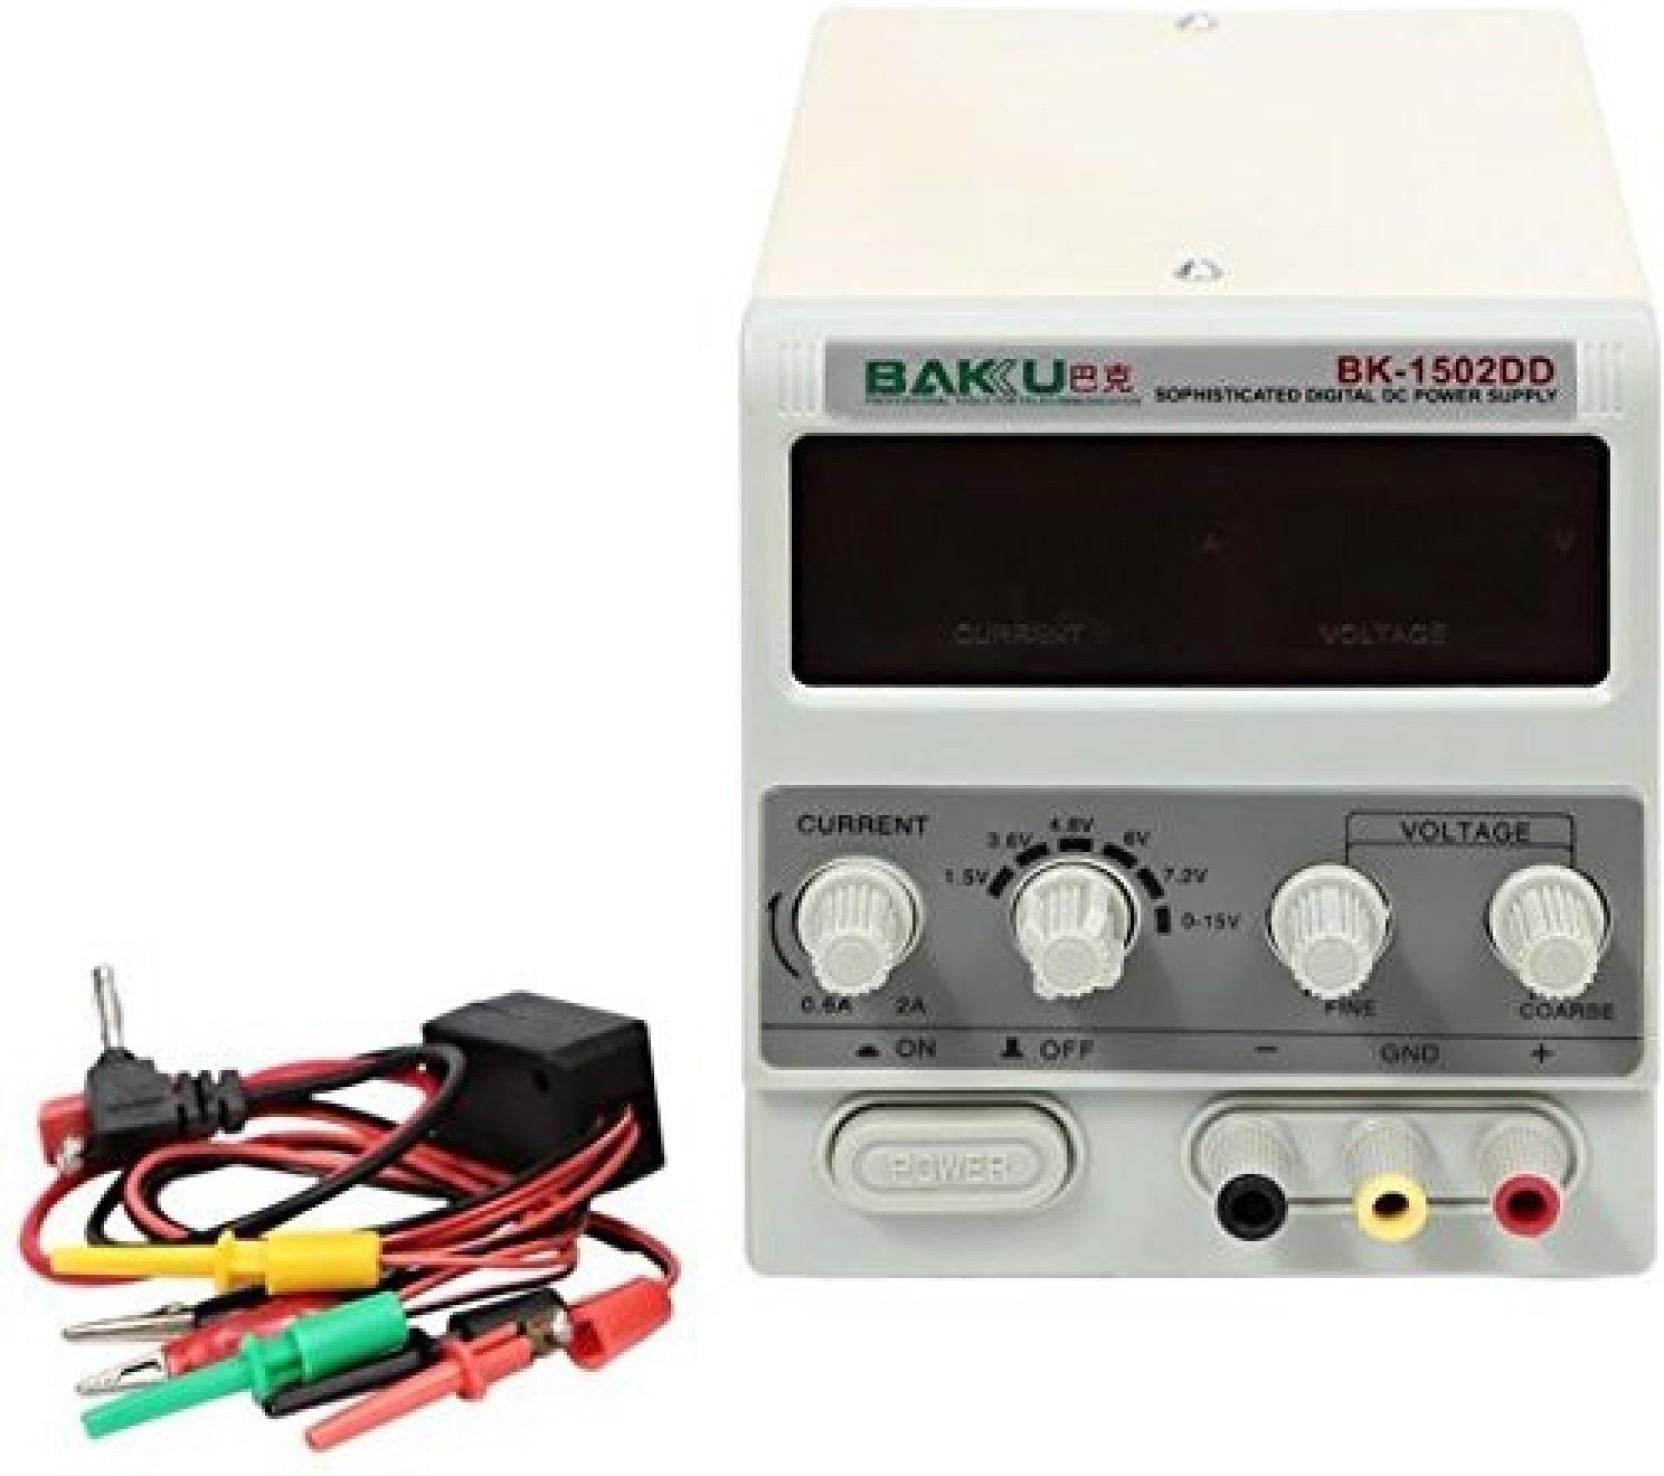 Bakku Bk 1502dd Sophisticated Regulated Dc Power Supply Add To Cart